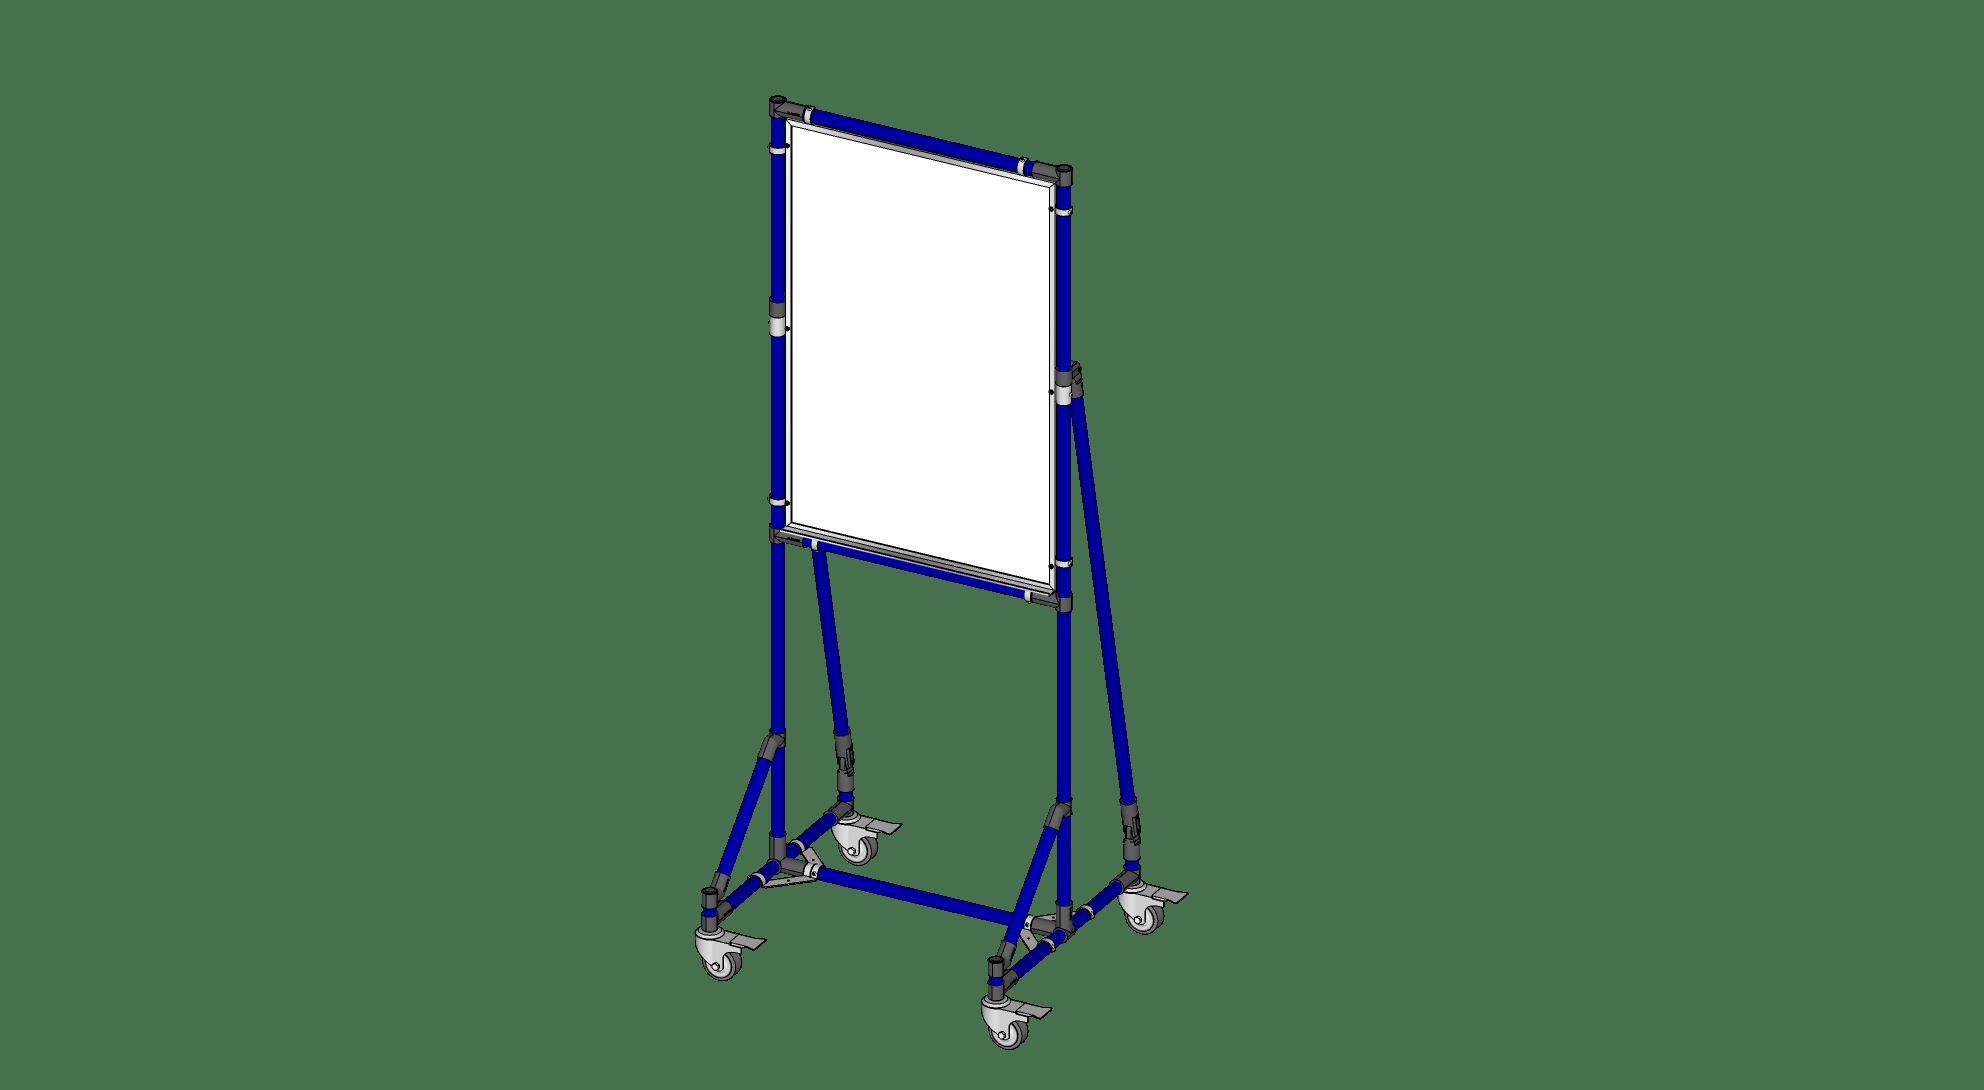 Single Sided 2' x 3' White Board